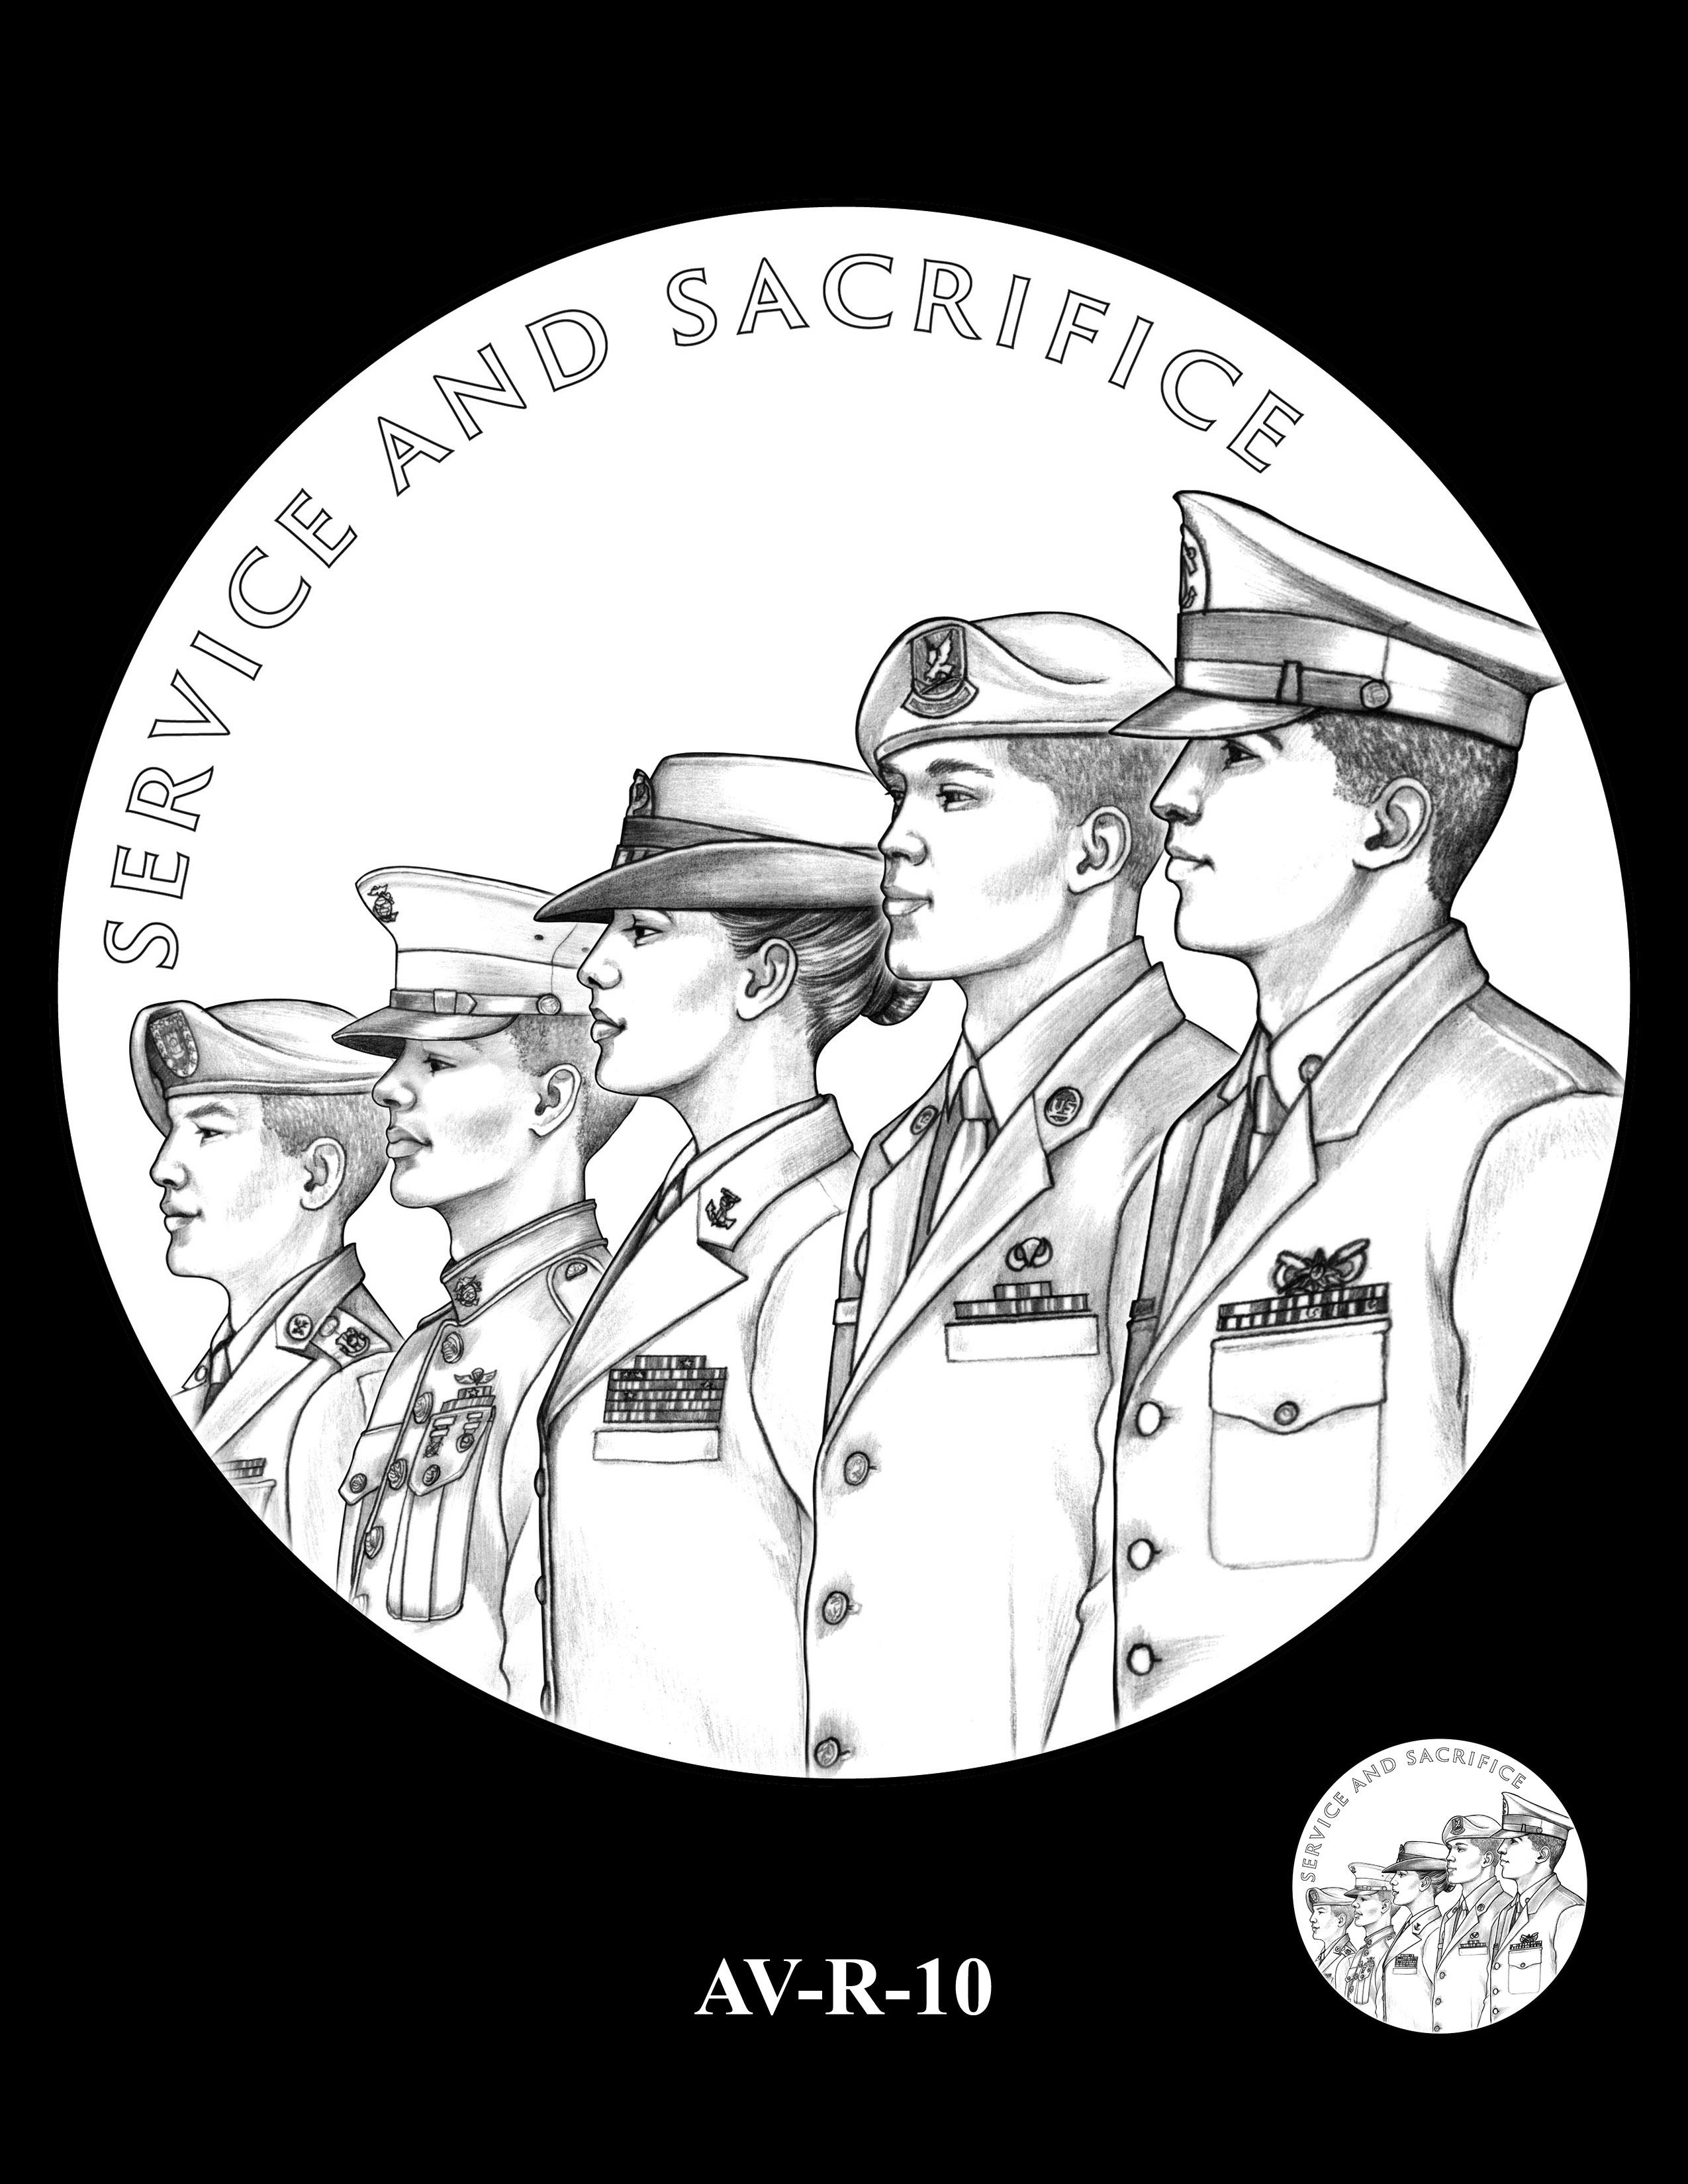 AV-R-10 - American Veterans Medal